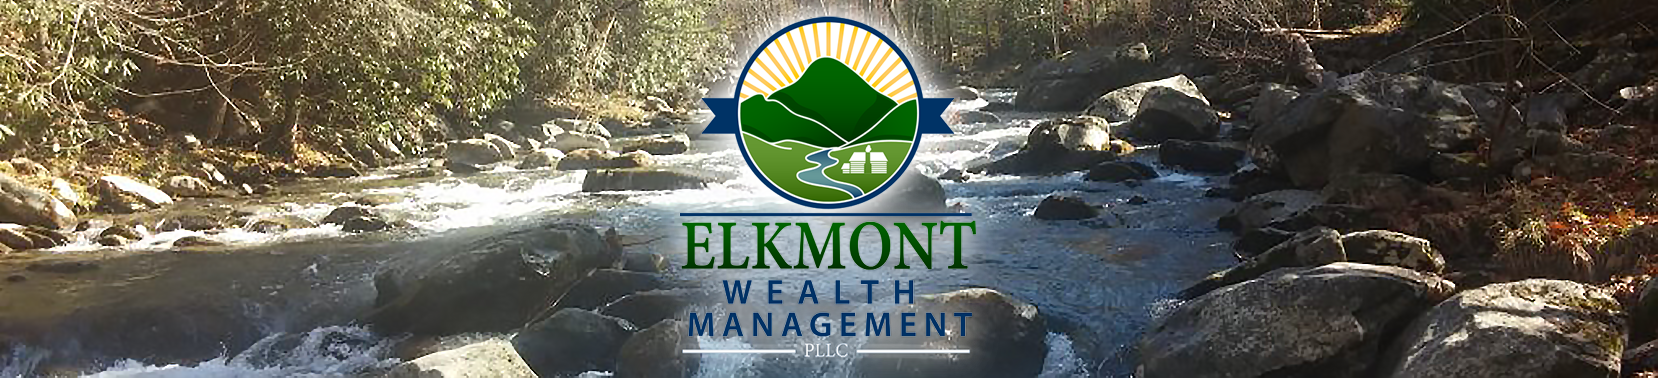 elkmont banner 4